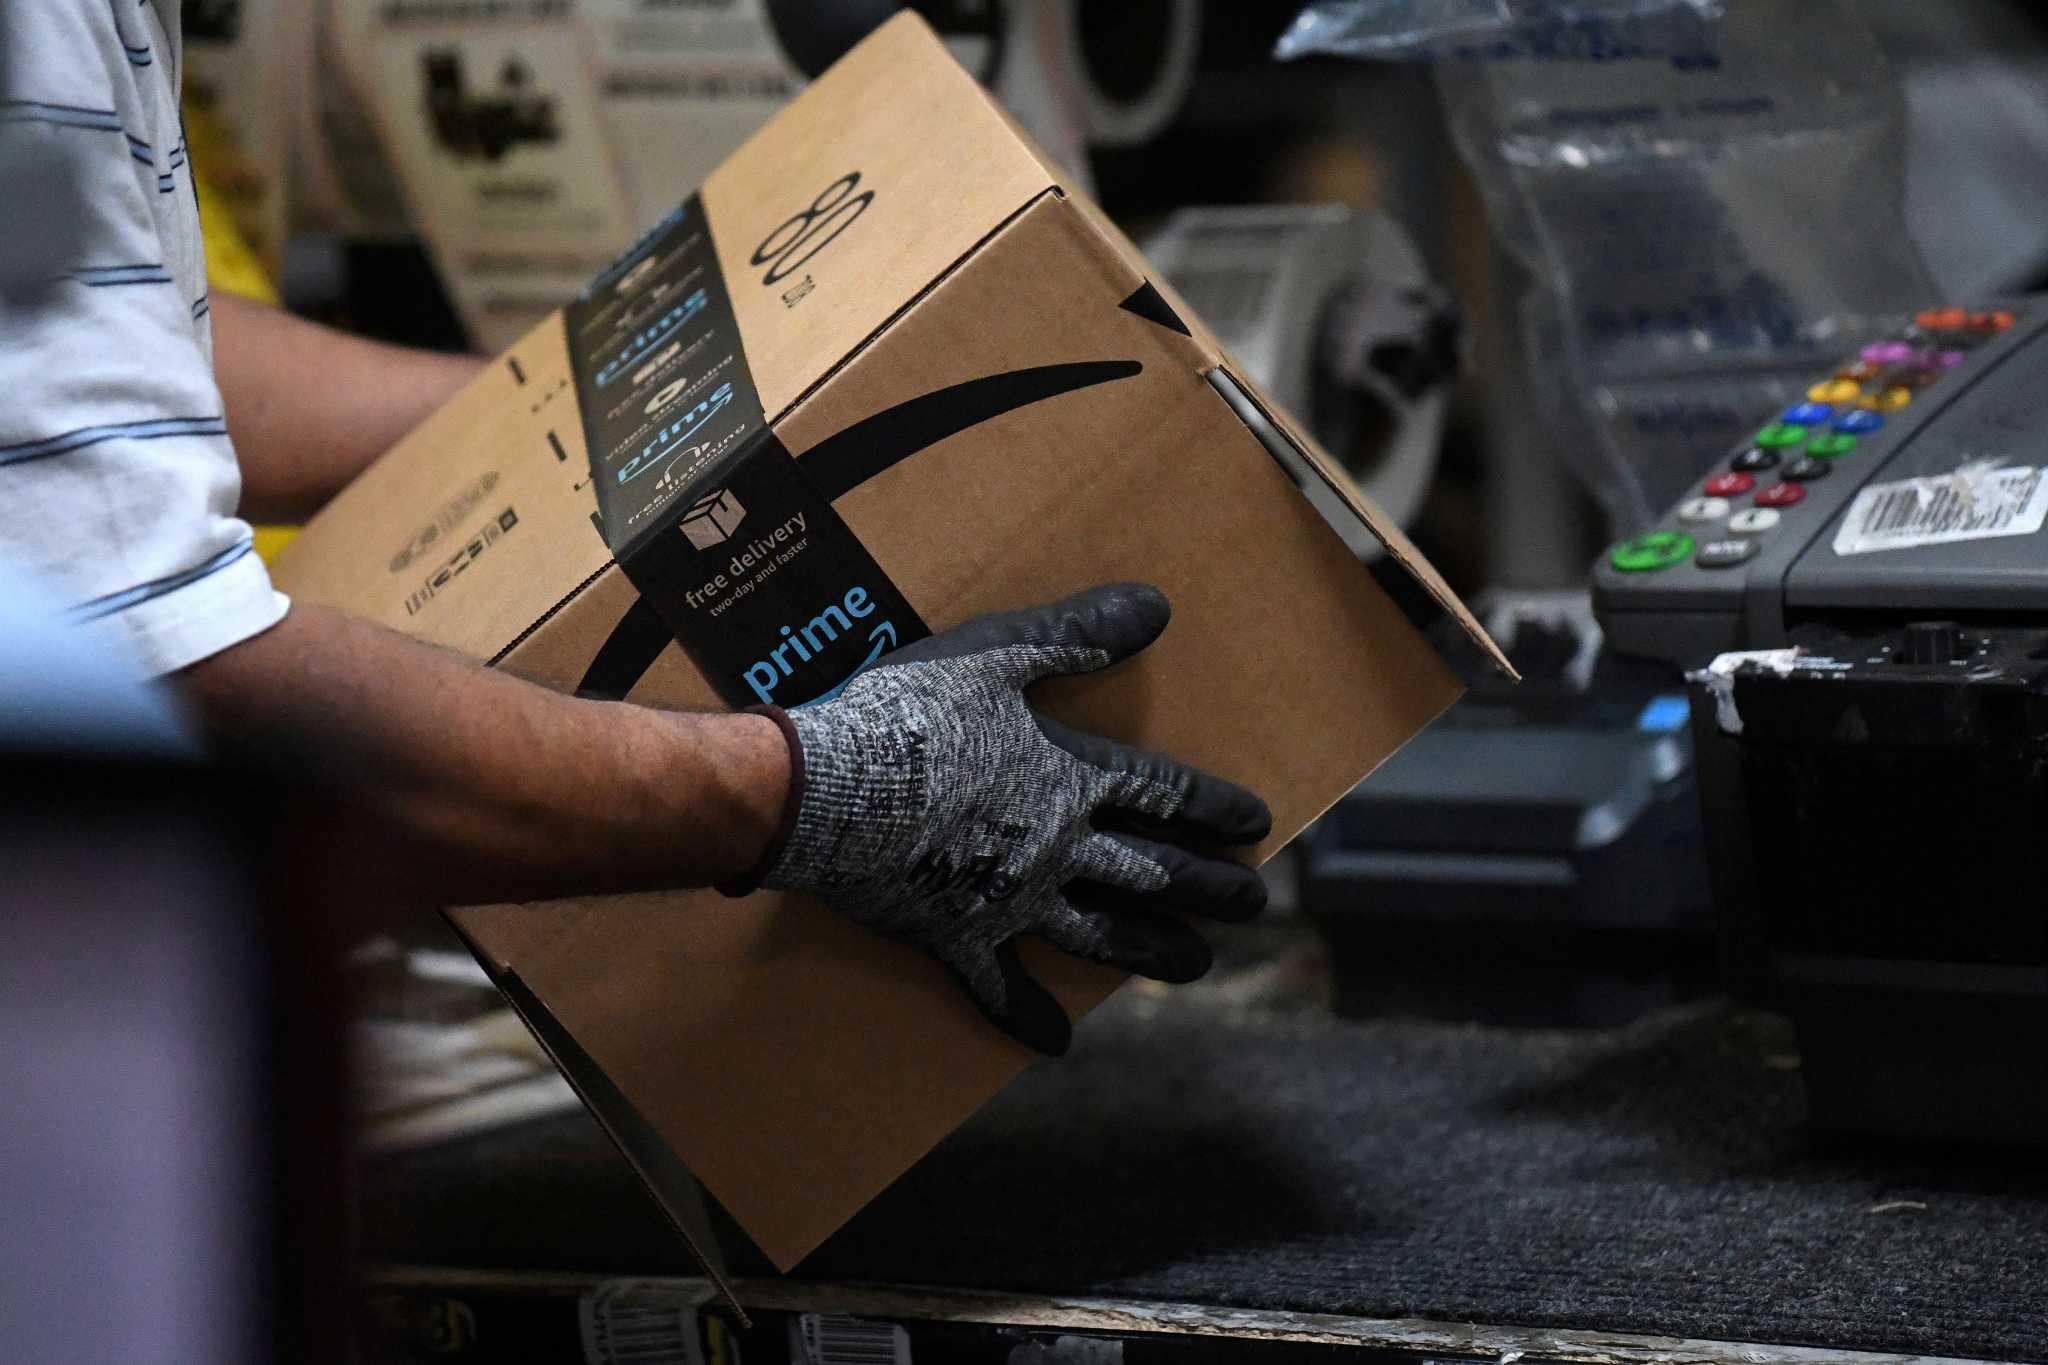 Amazon: «Χαστούκι» στον κολοσσό – «Εκδικητικές και παράνομες» οι απολύσεις δύο εργαζομένων